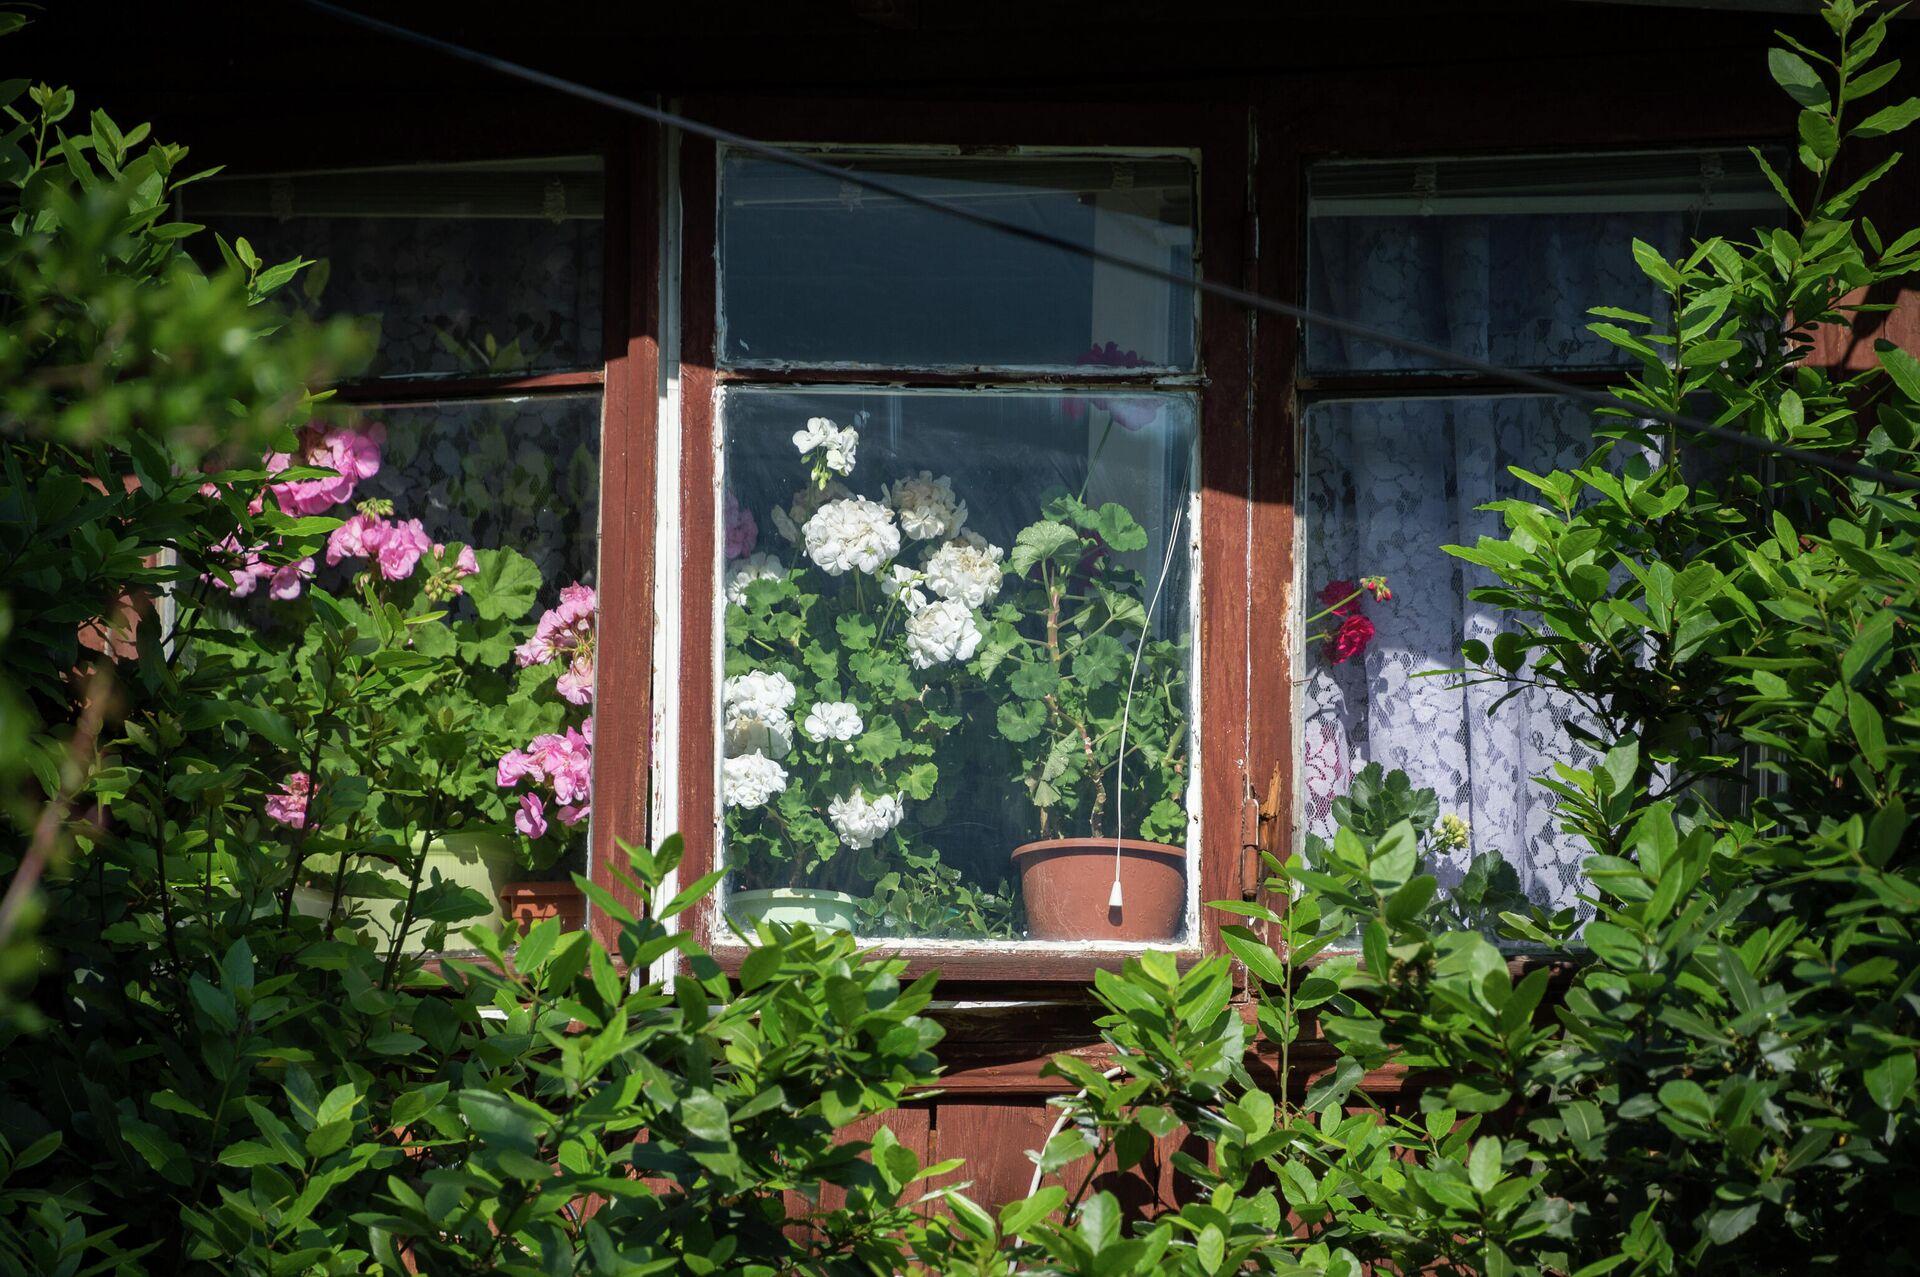 Окно жилого дома - РИА Новости, 1920, 06.10.2021